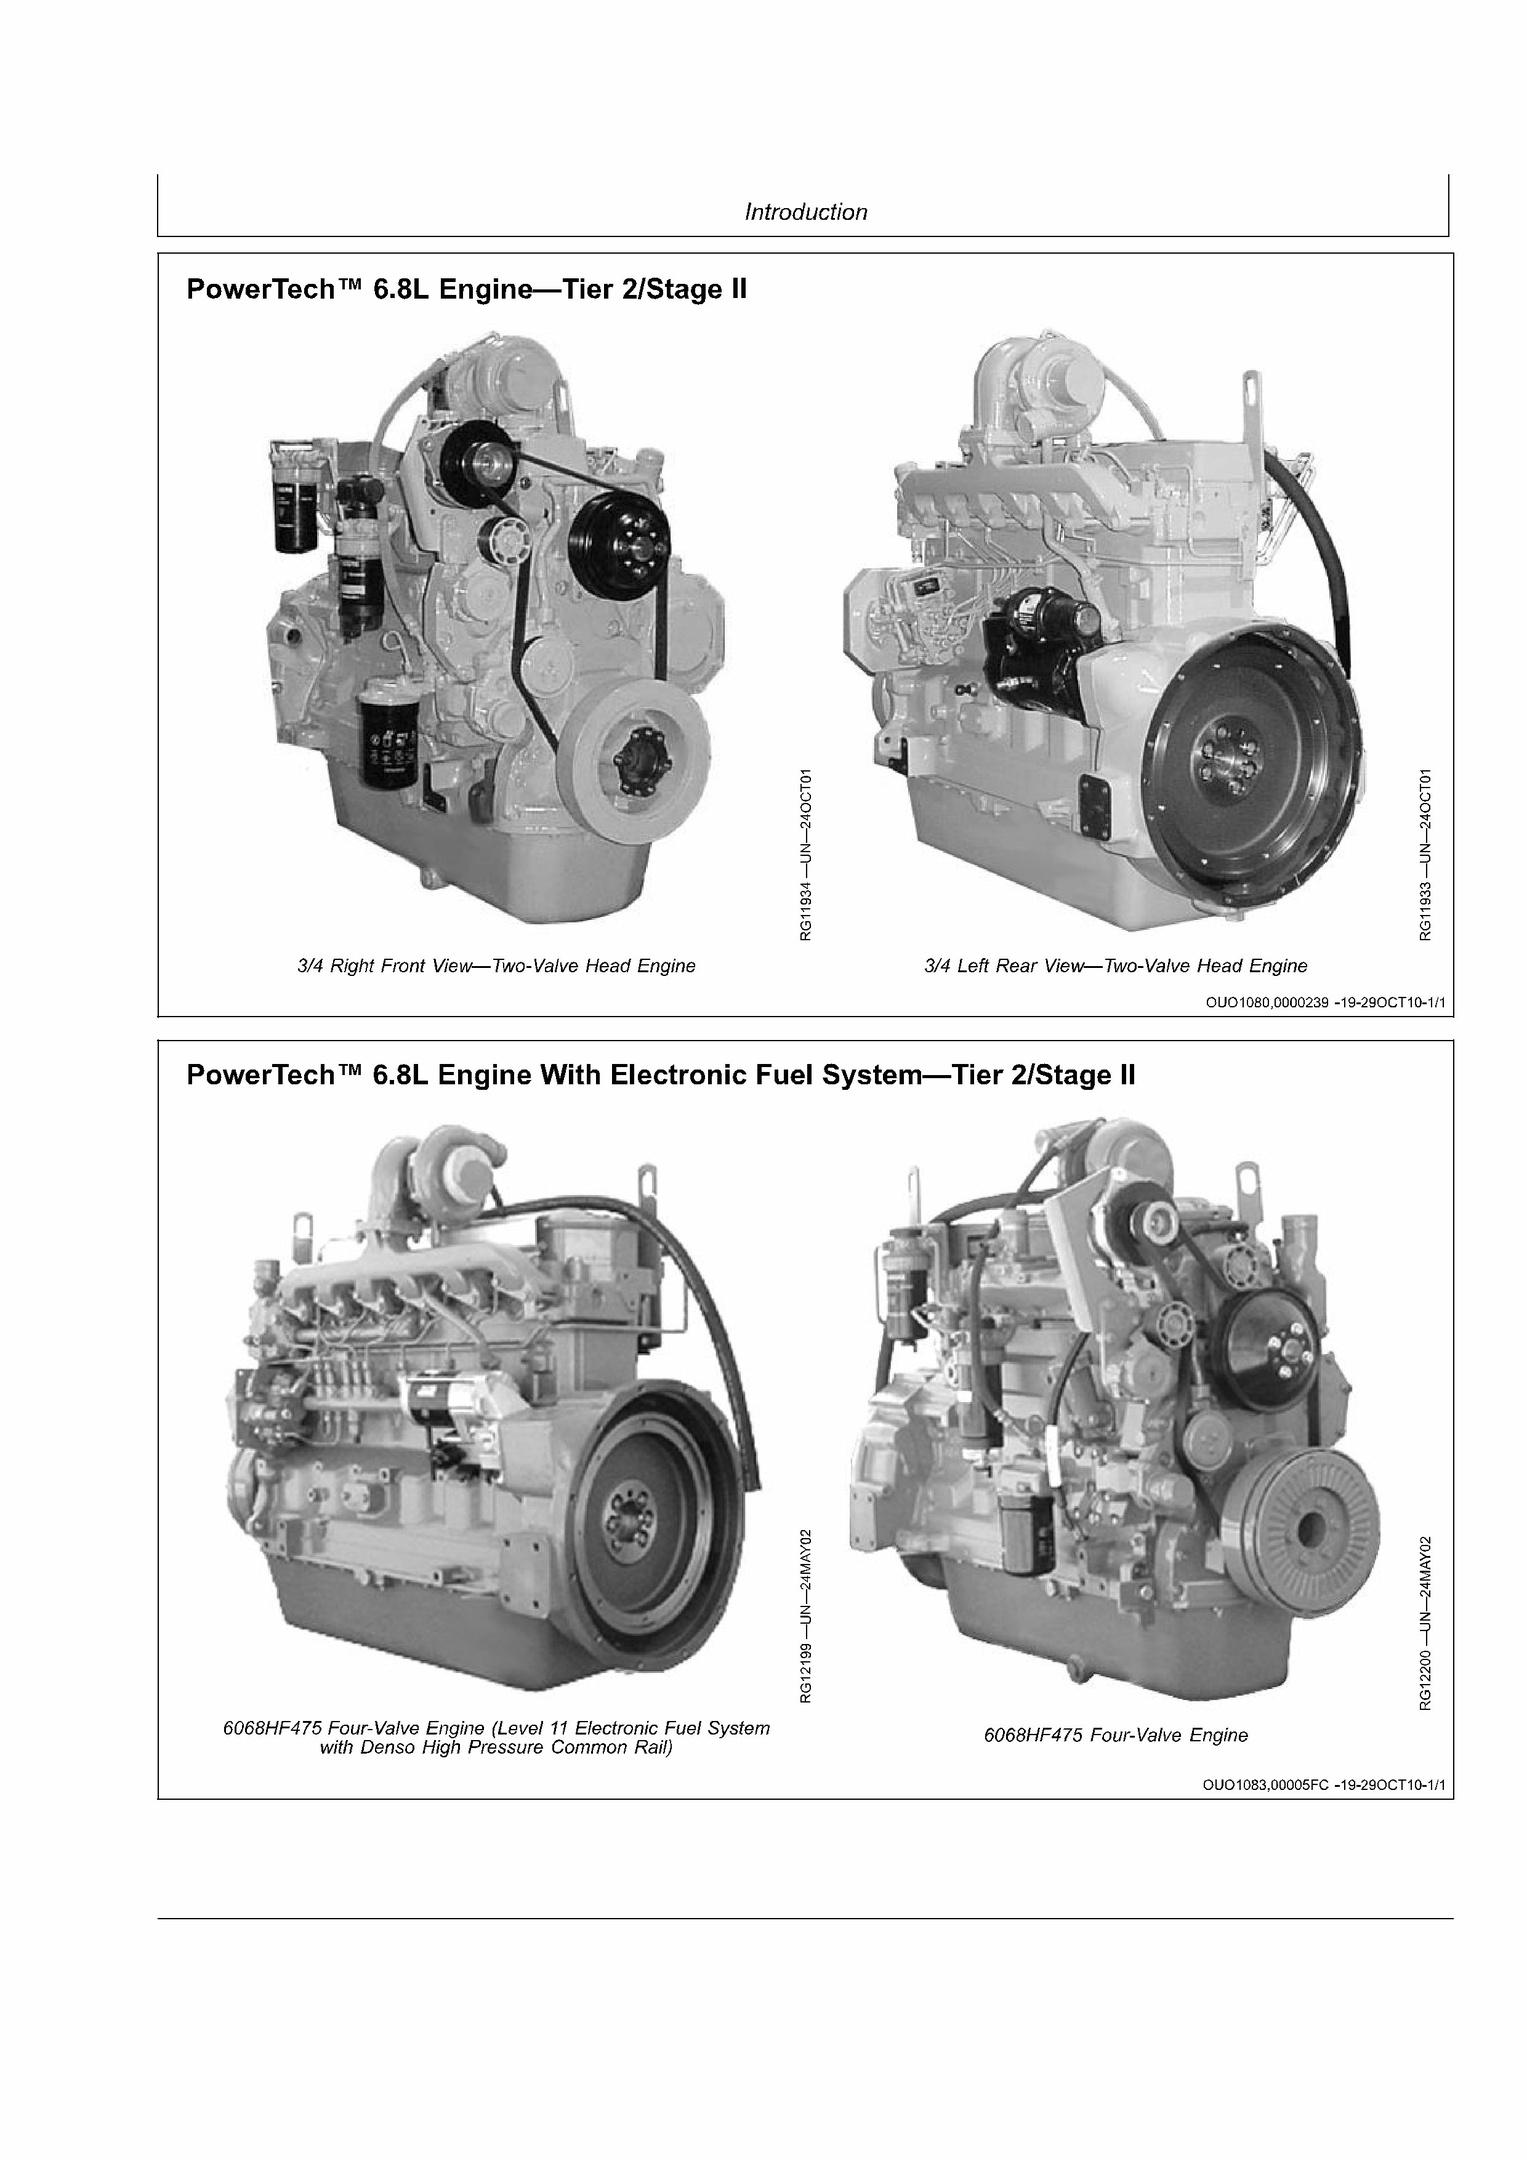 Mitsubishi 4m51 engine service manual ebook best deal image pdf engine pdf download john deere 6068tfm75 6068tfm76 marine engines repair service technical manual pdf pdf fandeluxe Choice Image